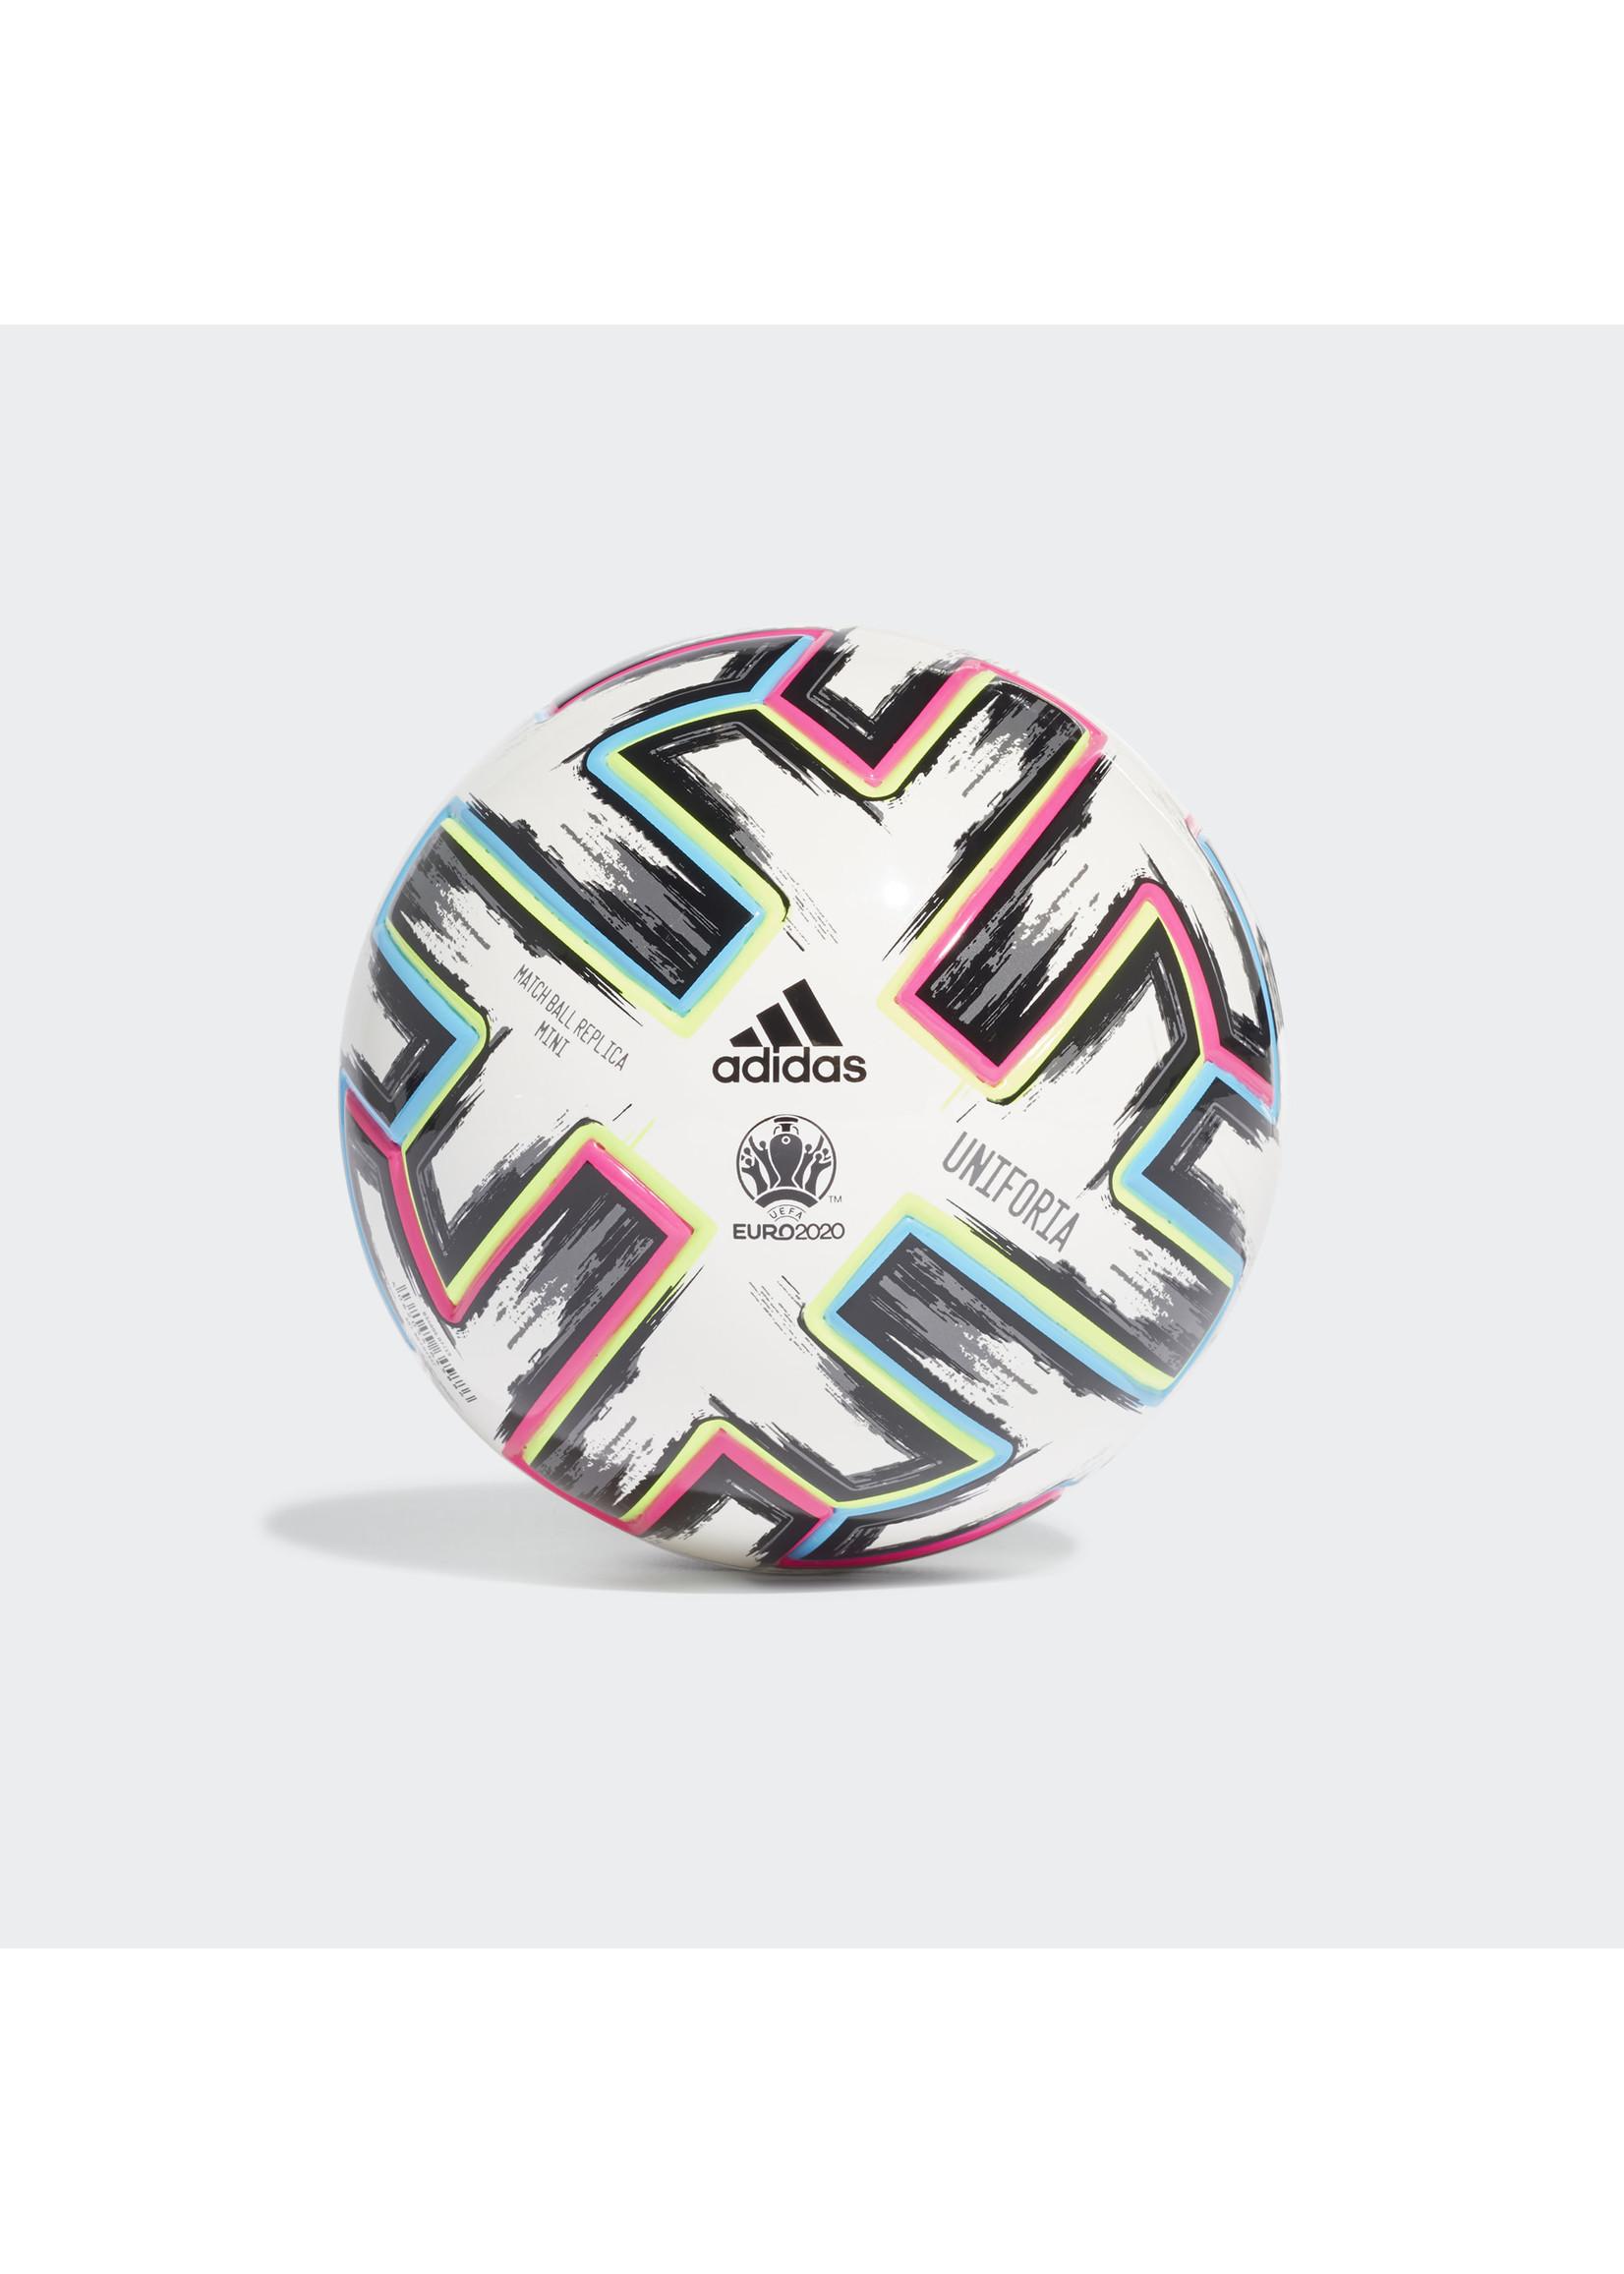 Adidas Euro 2020 Mini Ball